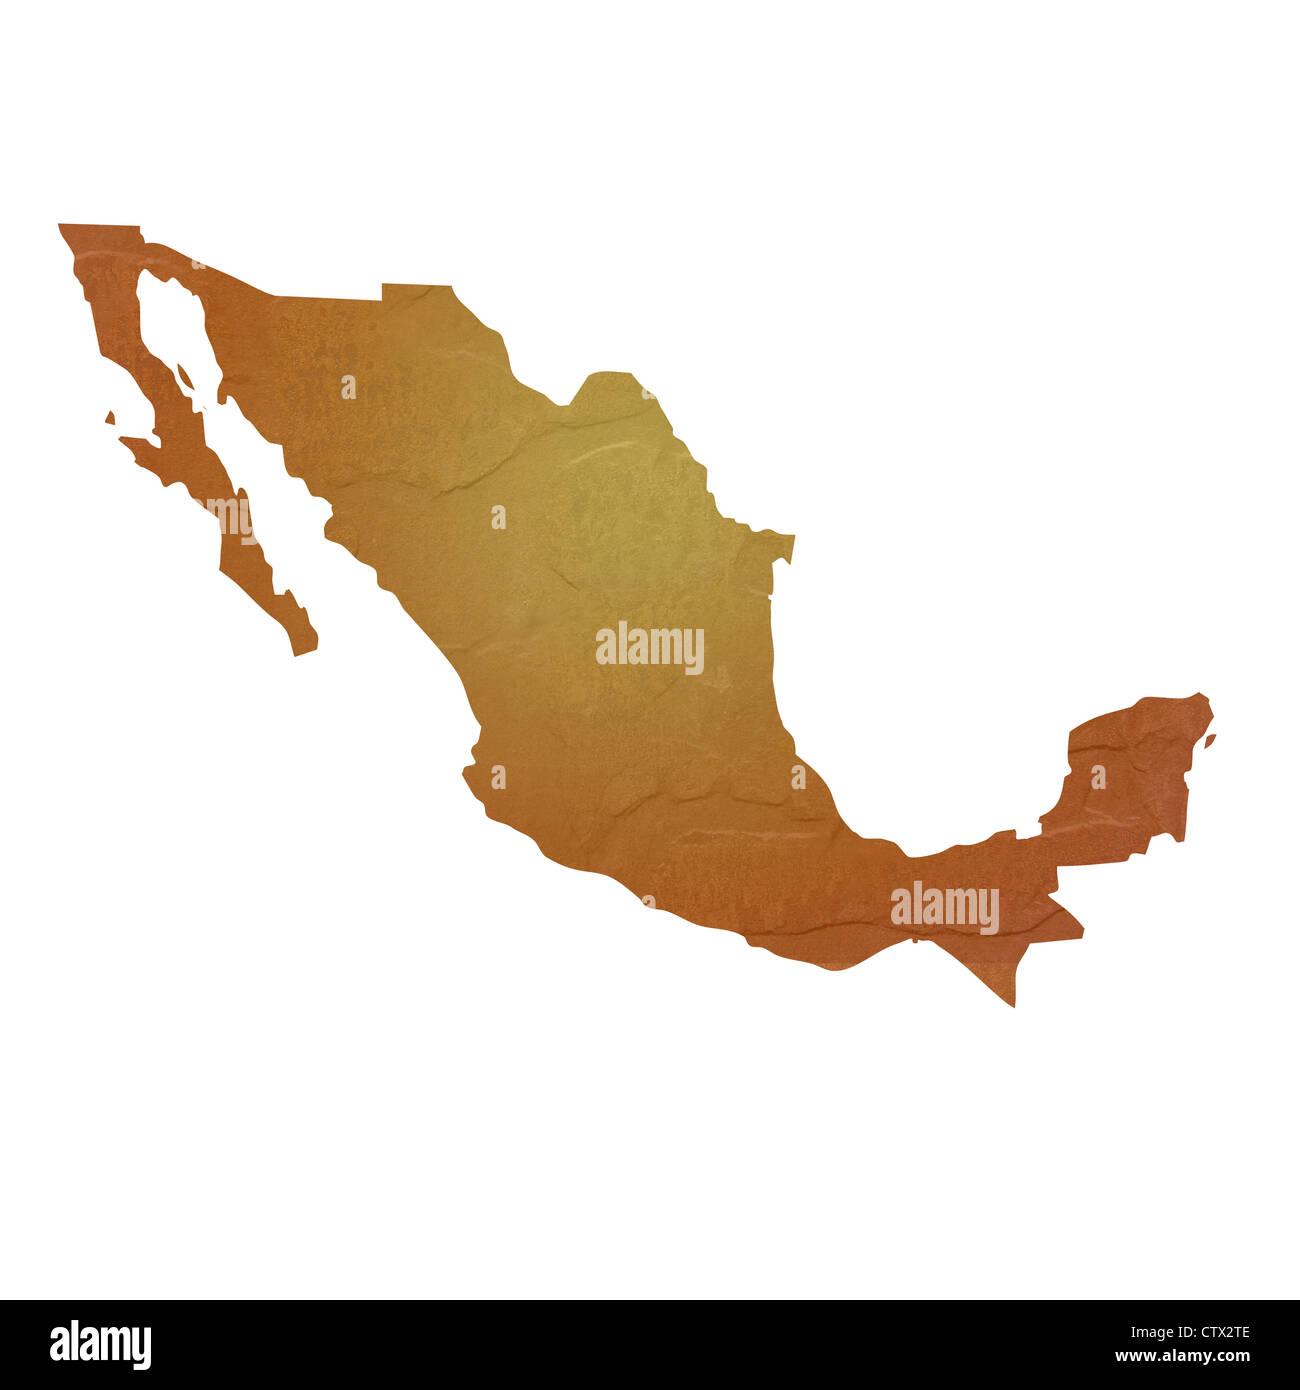 Mexico South America Map Stock Photos & Mexico South America Map ...